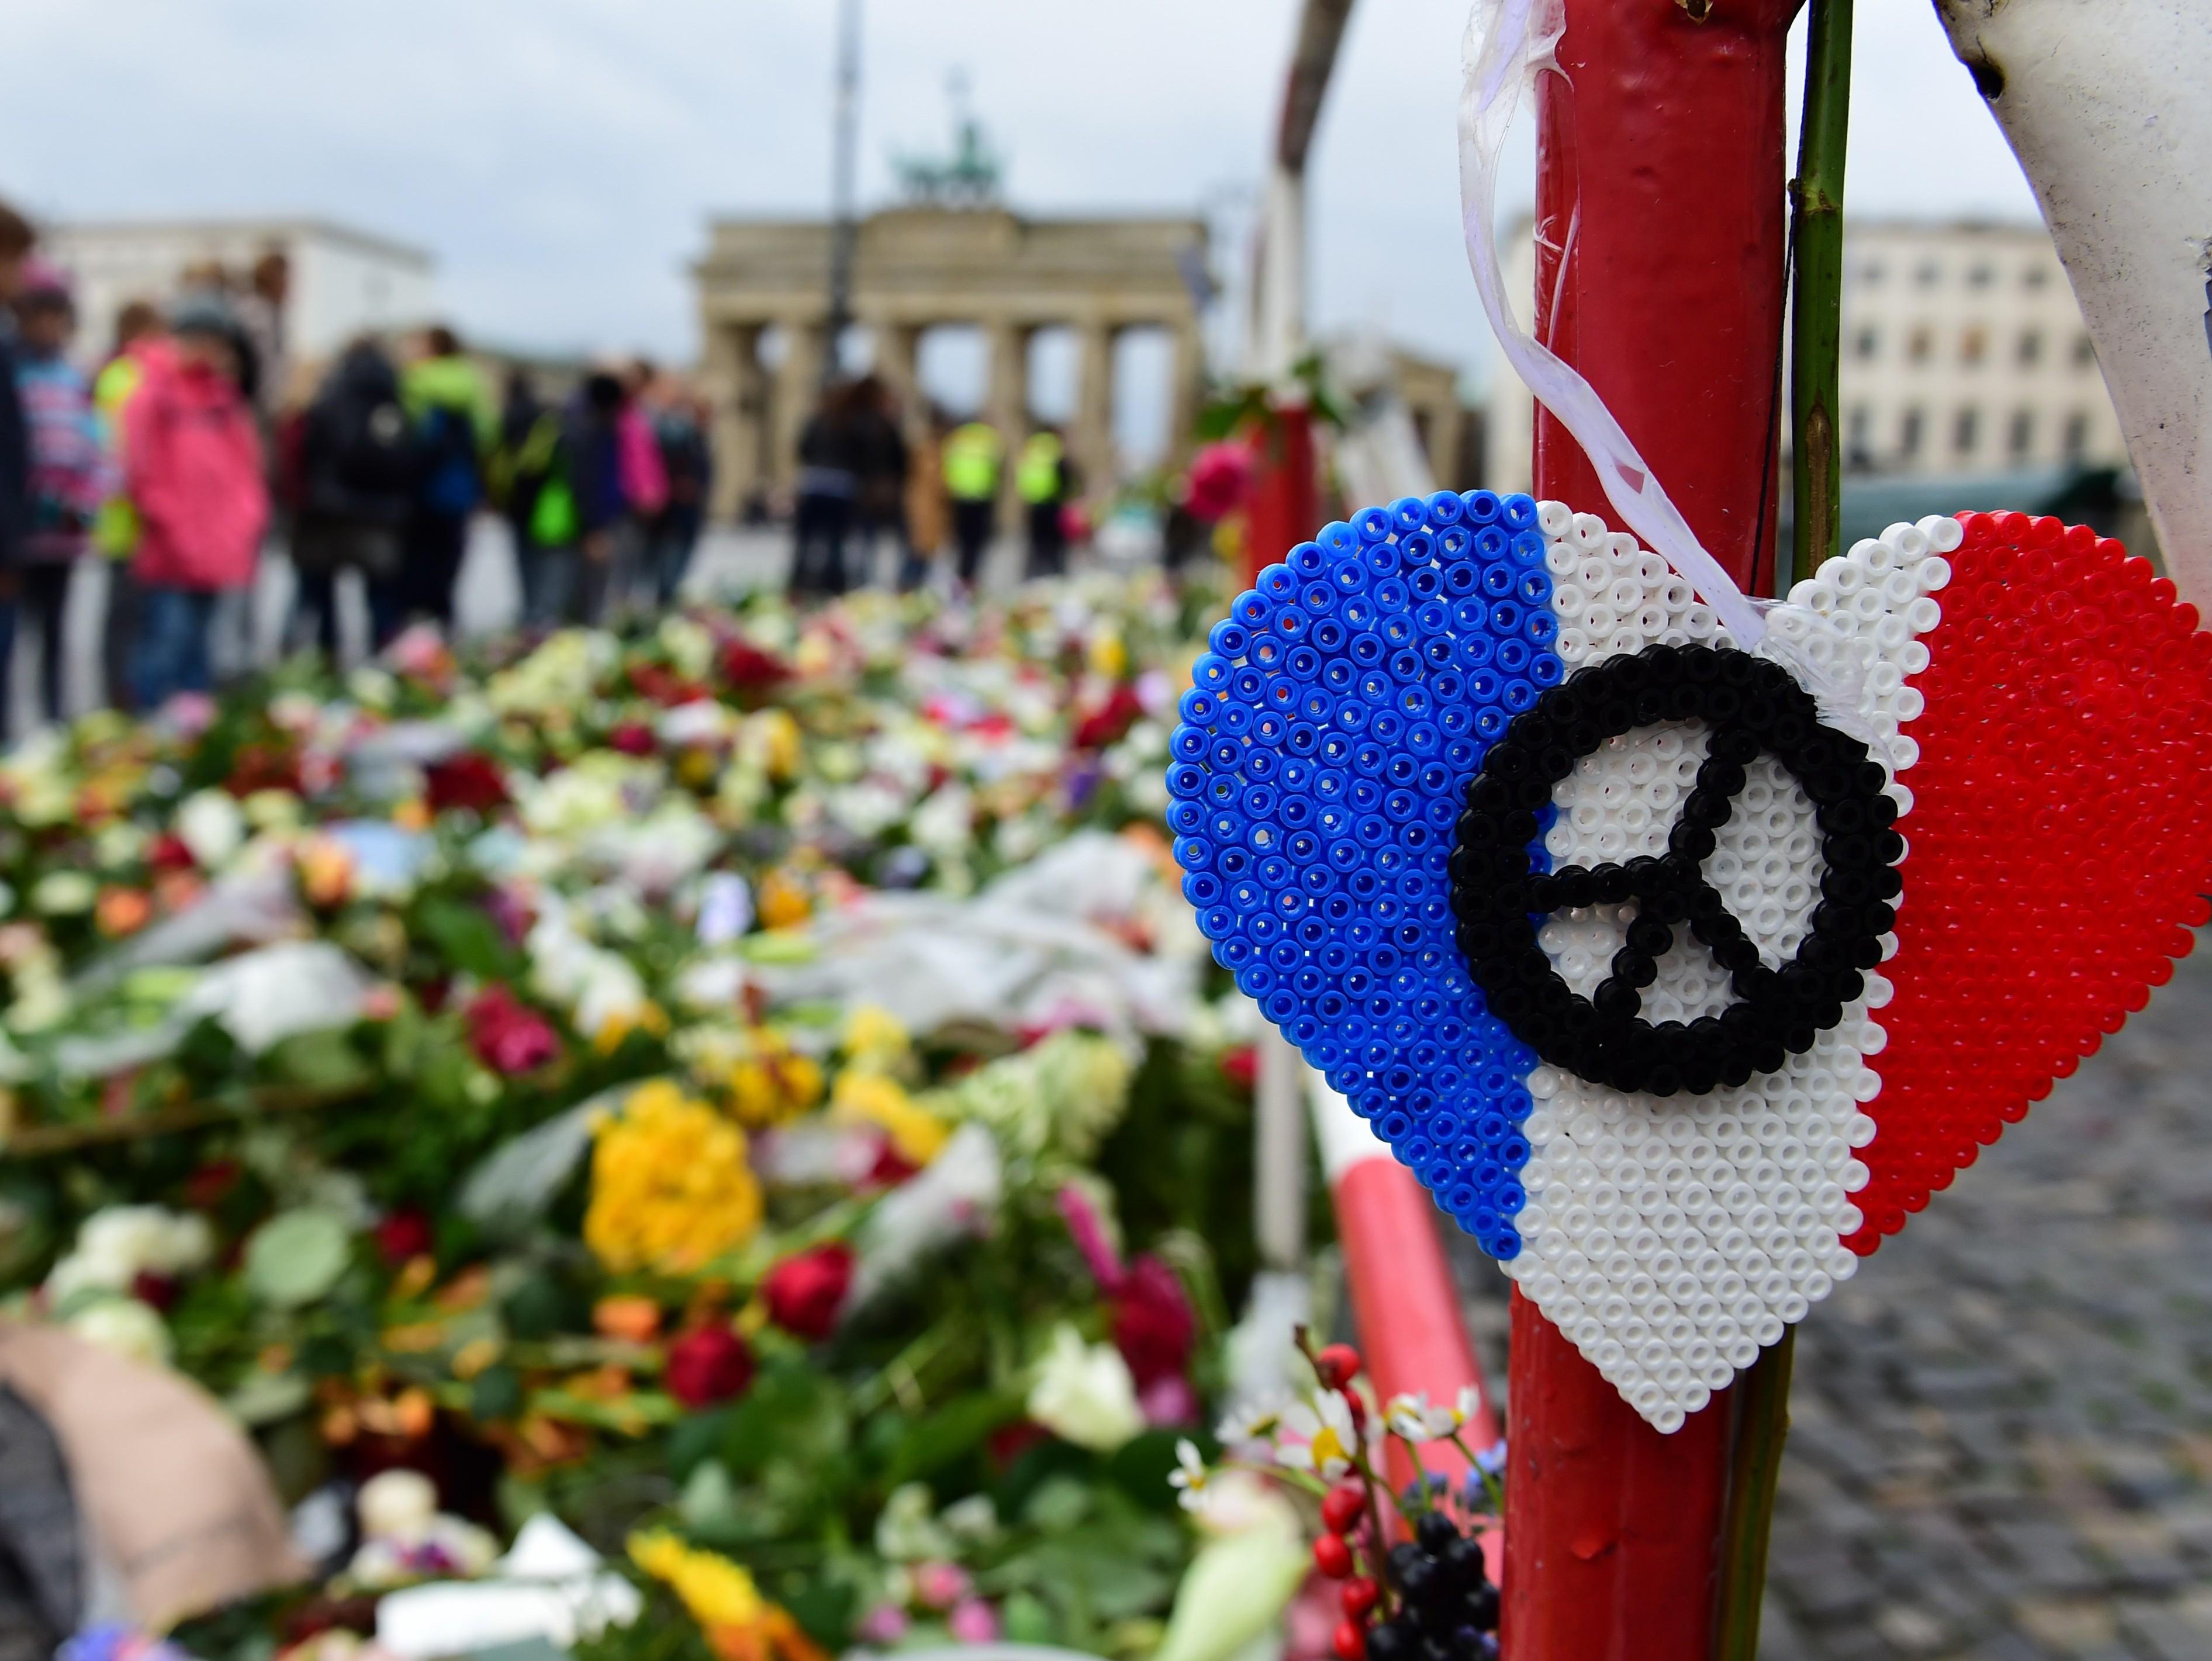 GERMANY-FRANCE-ATTACKS-MEMORIAL